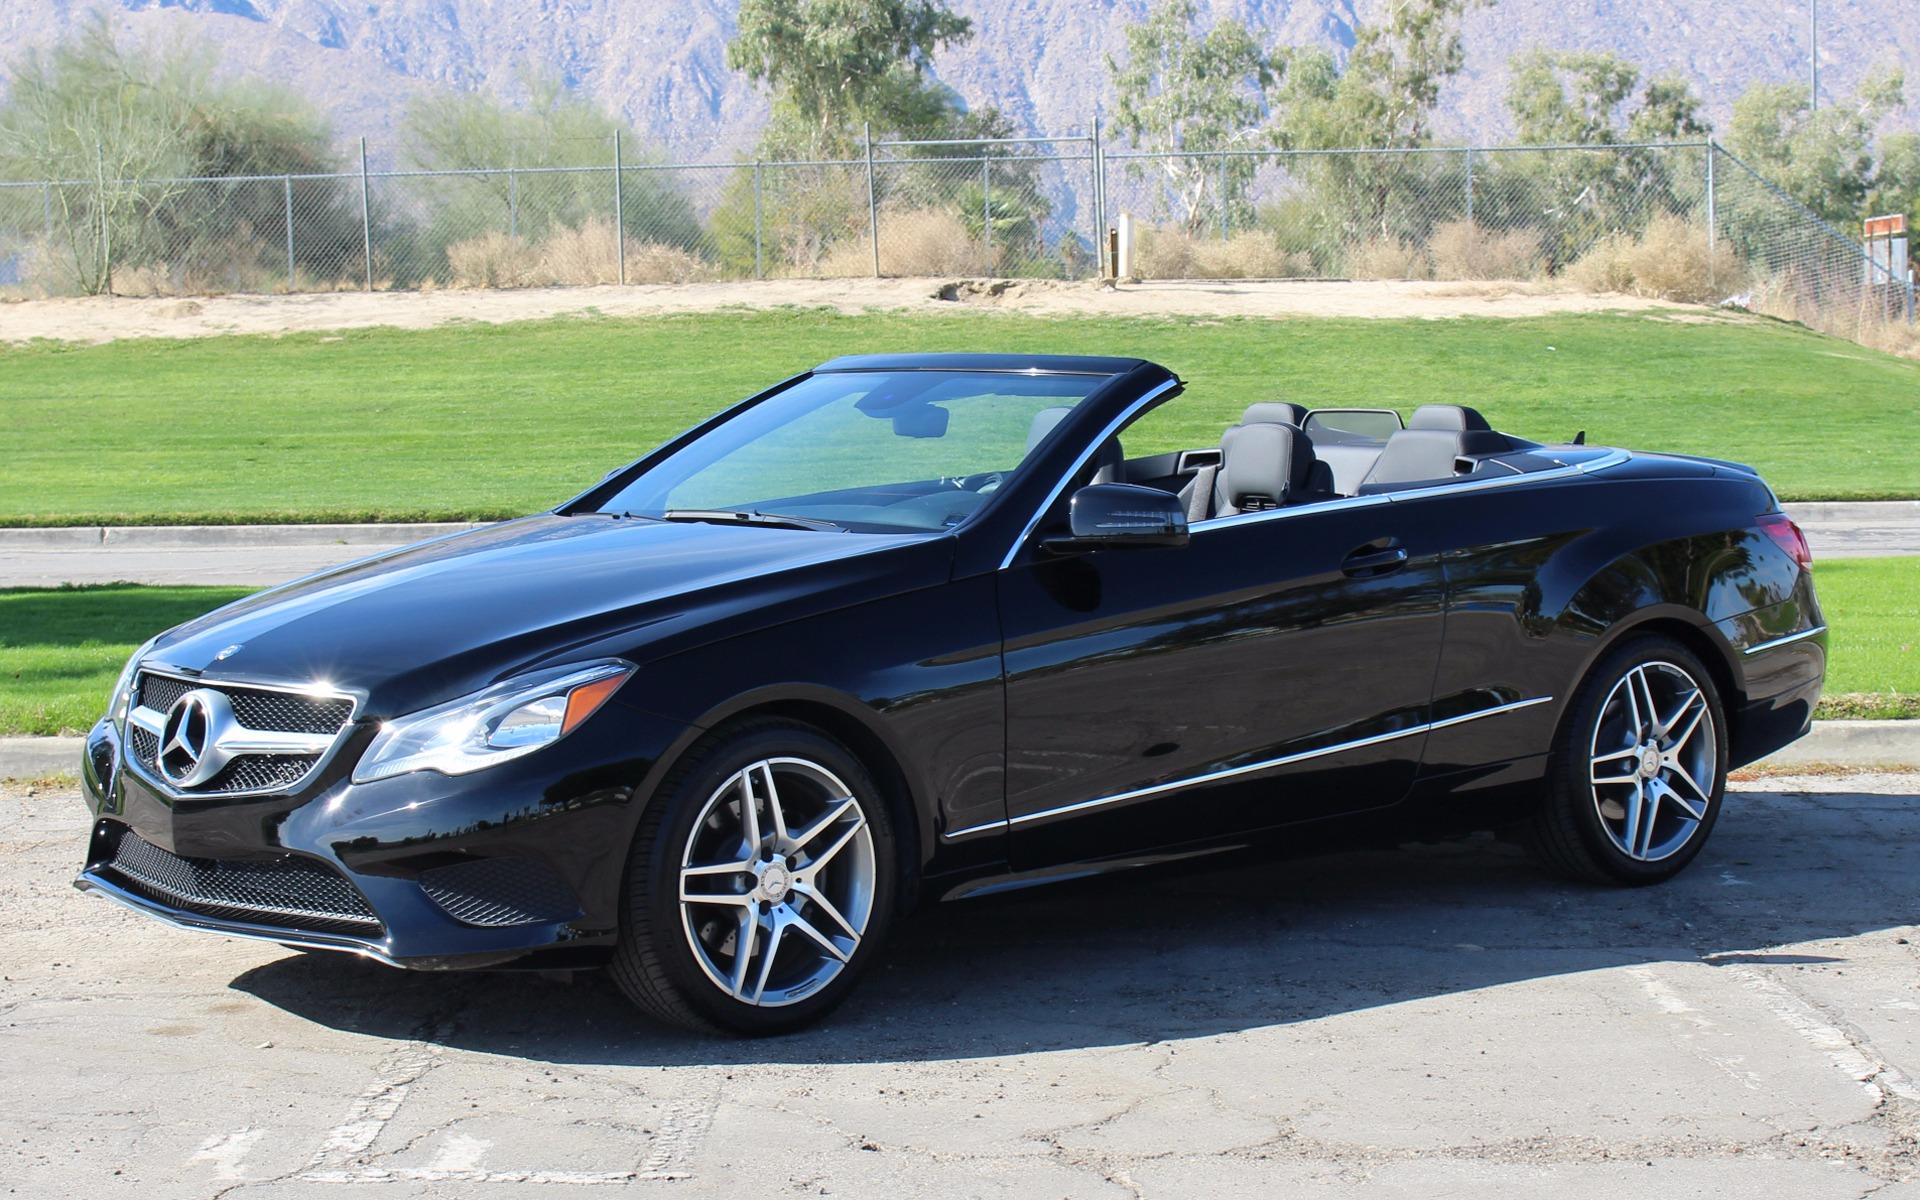 2014 mercedes benz e class e 350 stock m894 for sale for Mercedes benz e class 350 price